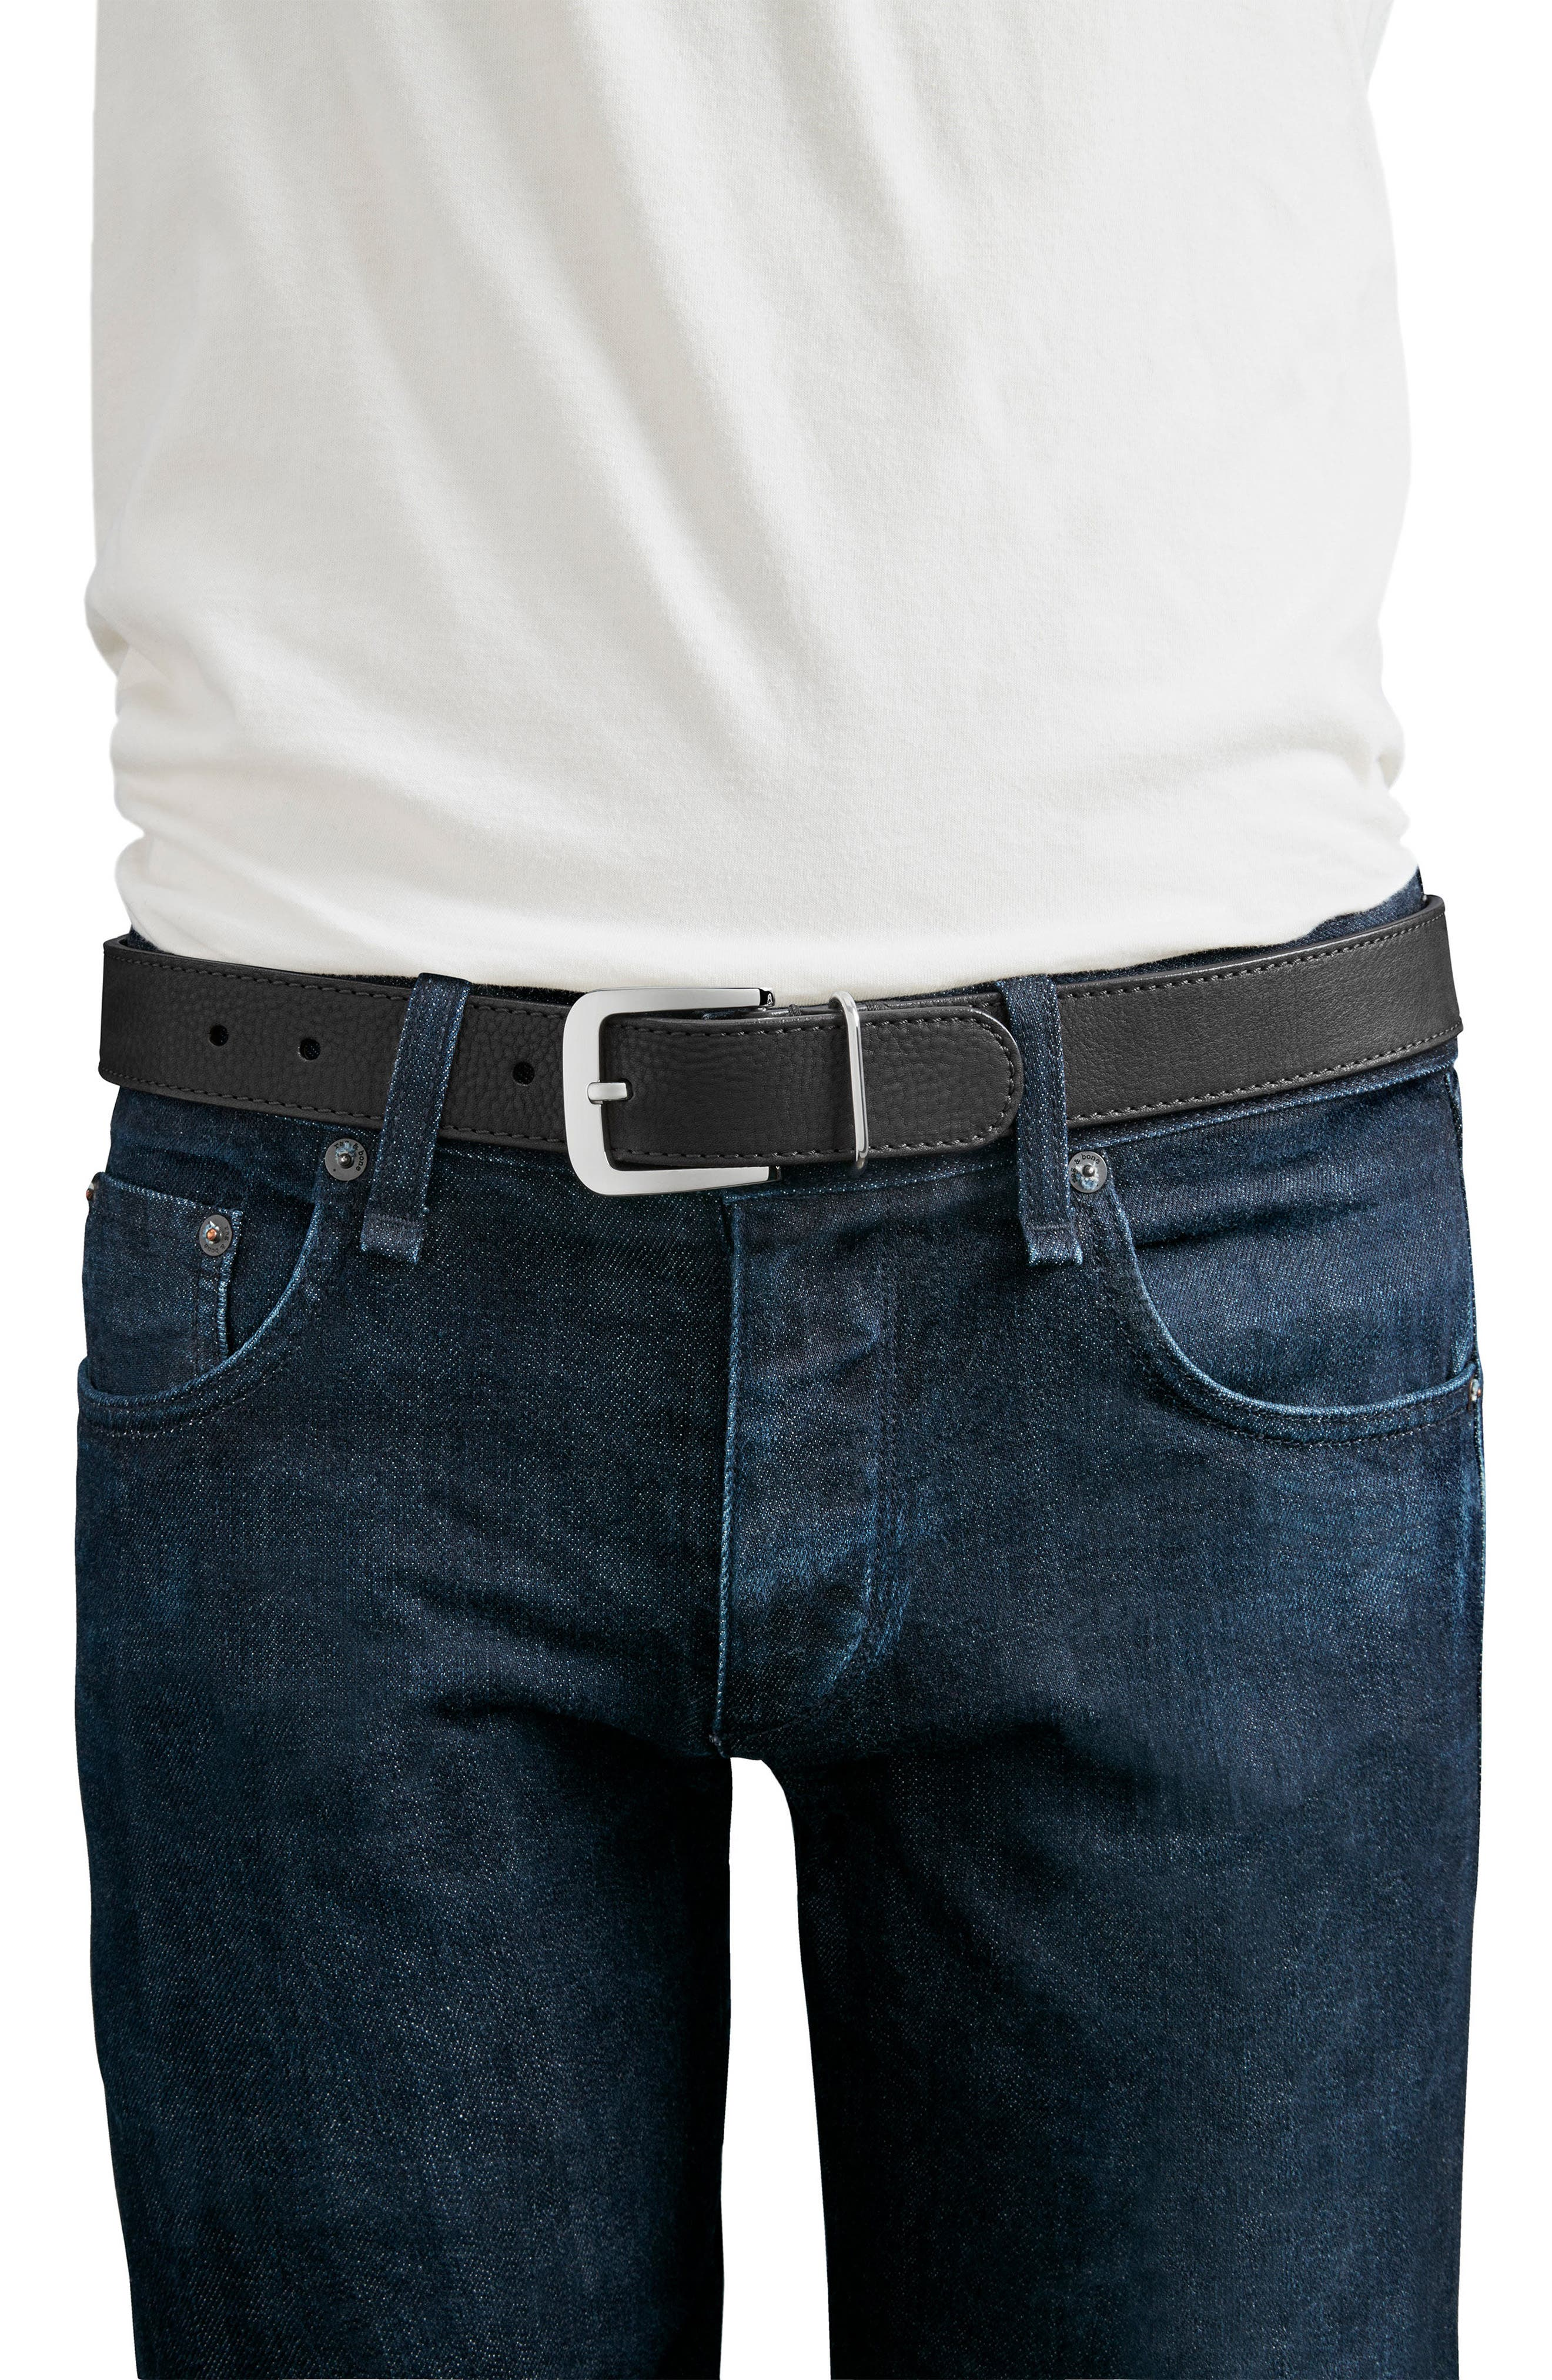 G10 Leather Belt,                             Alternate thumbnail 4, color,                             001